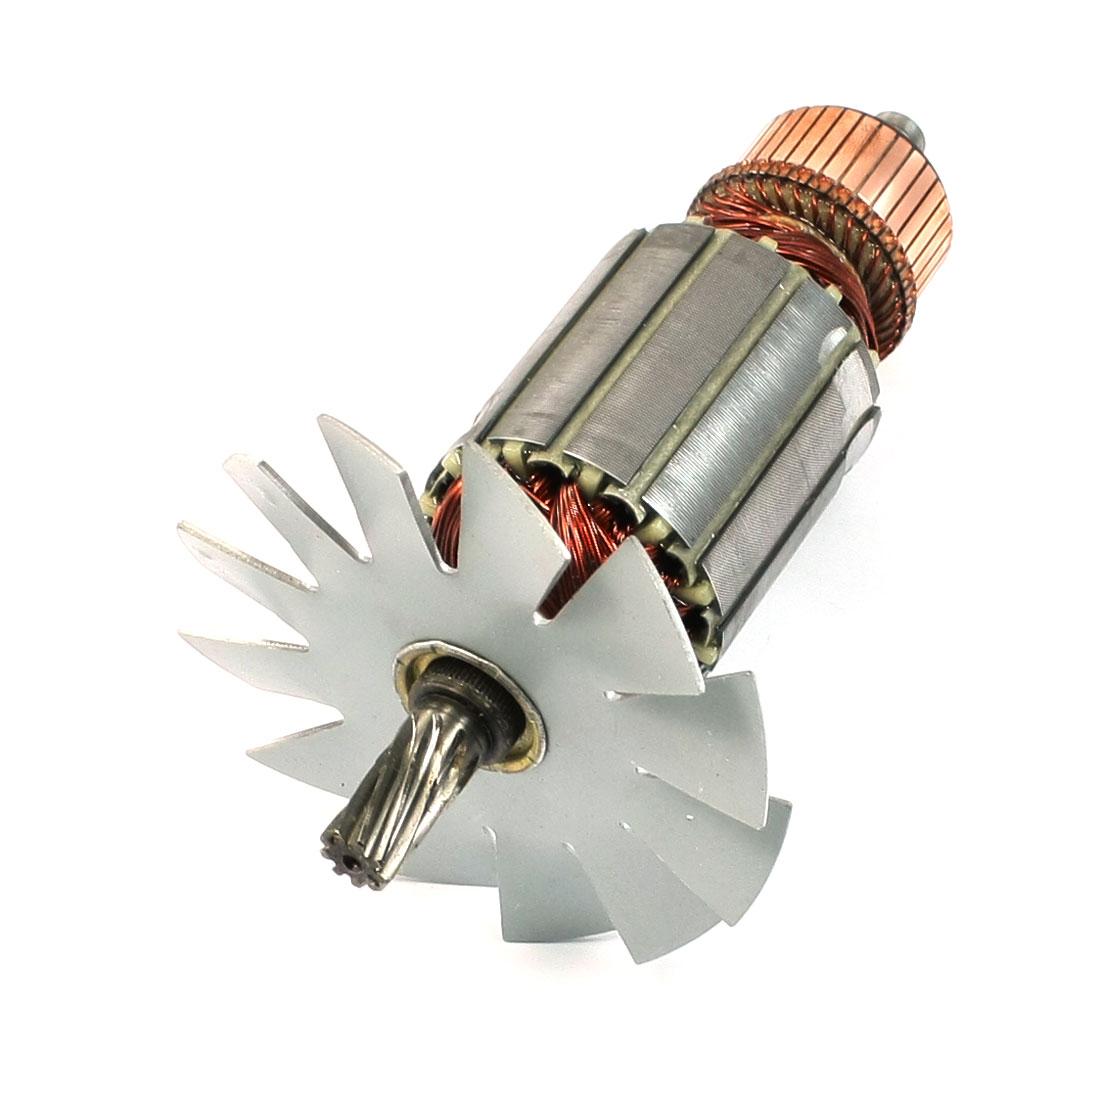 AC 220V 11mm Drive Shaft 9 Teeth Rotor Armature for Makita 5016B Electric Saw